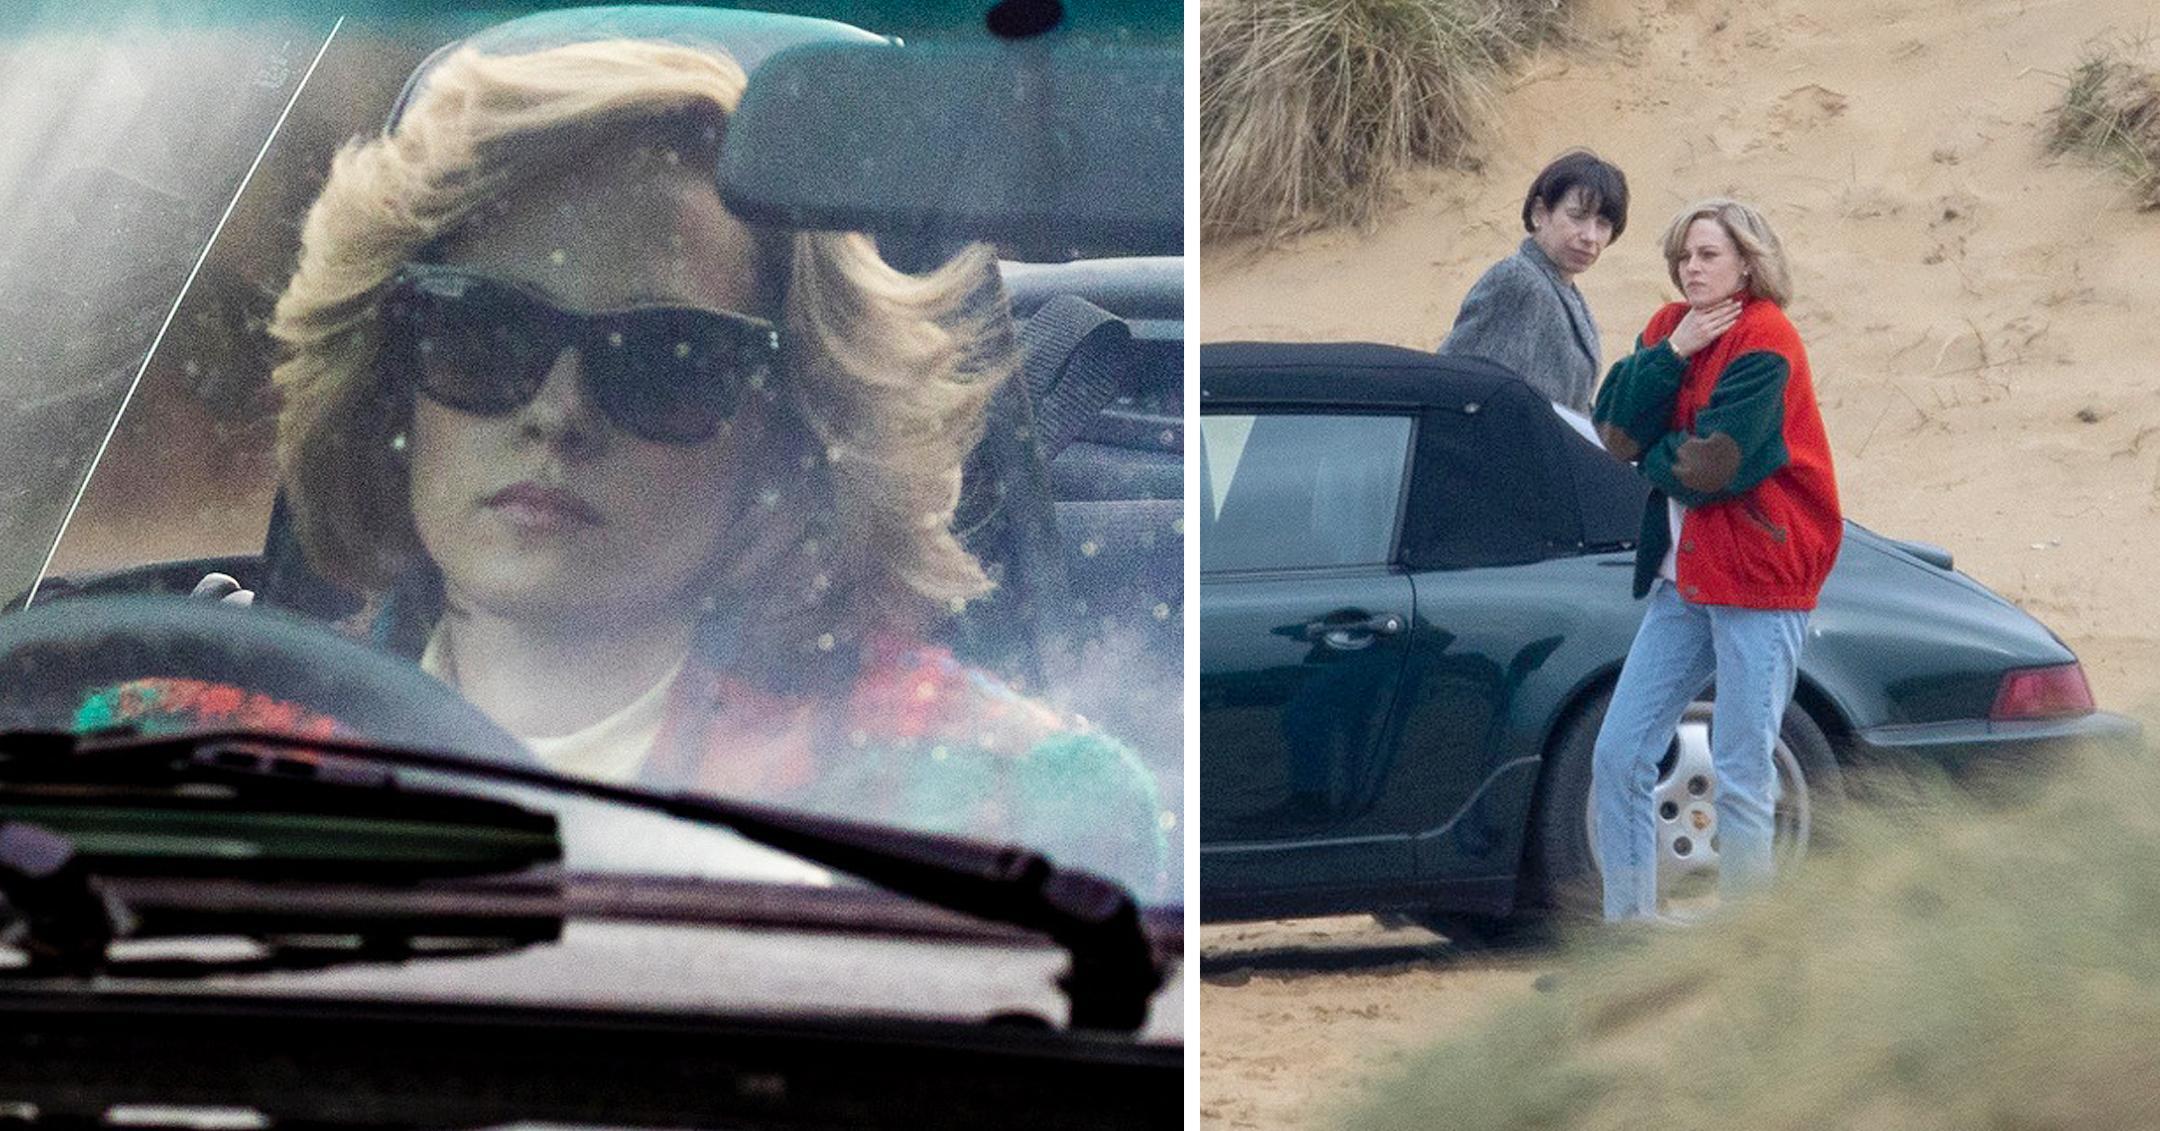 kristen stewart as princess diana on set of new movie